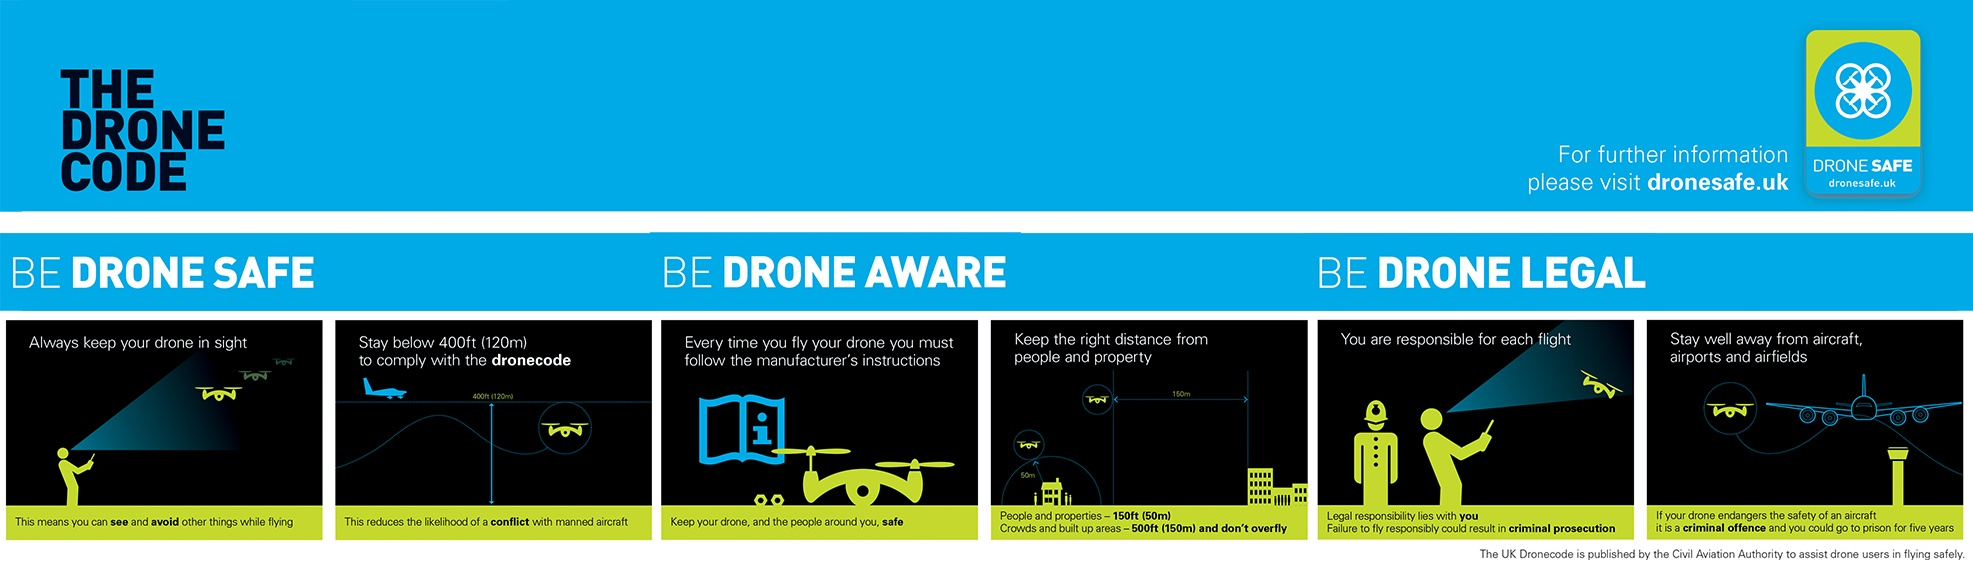 blog-drone-code-info50